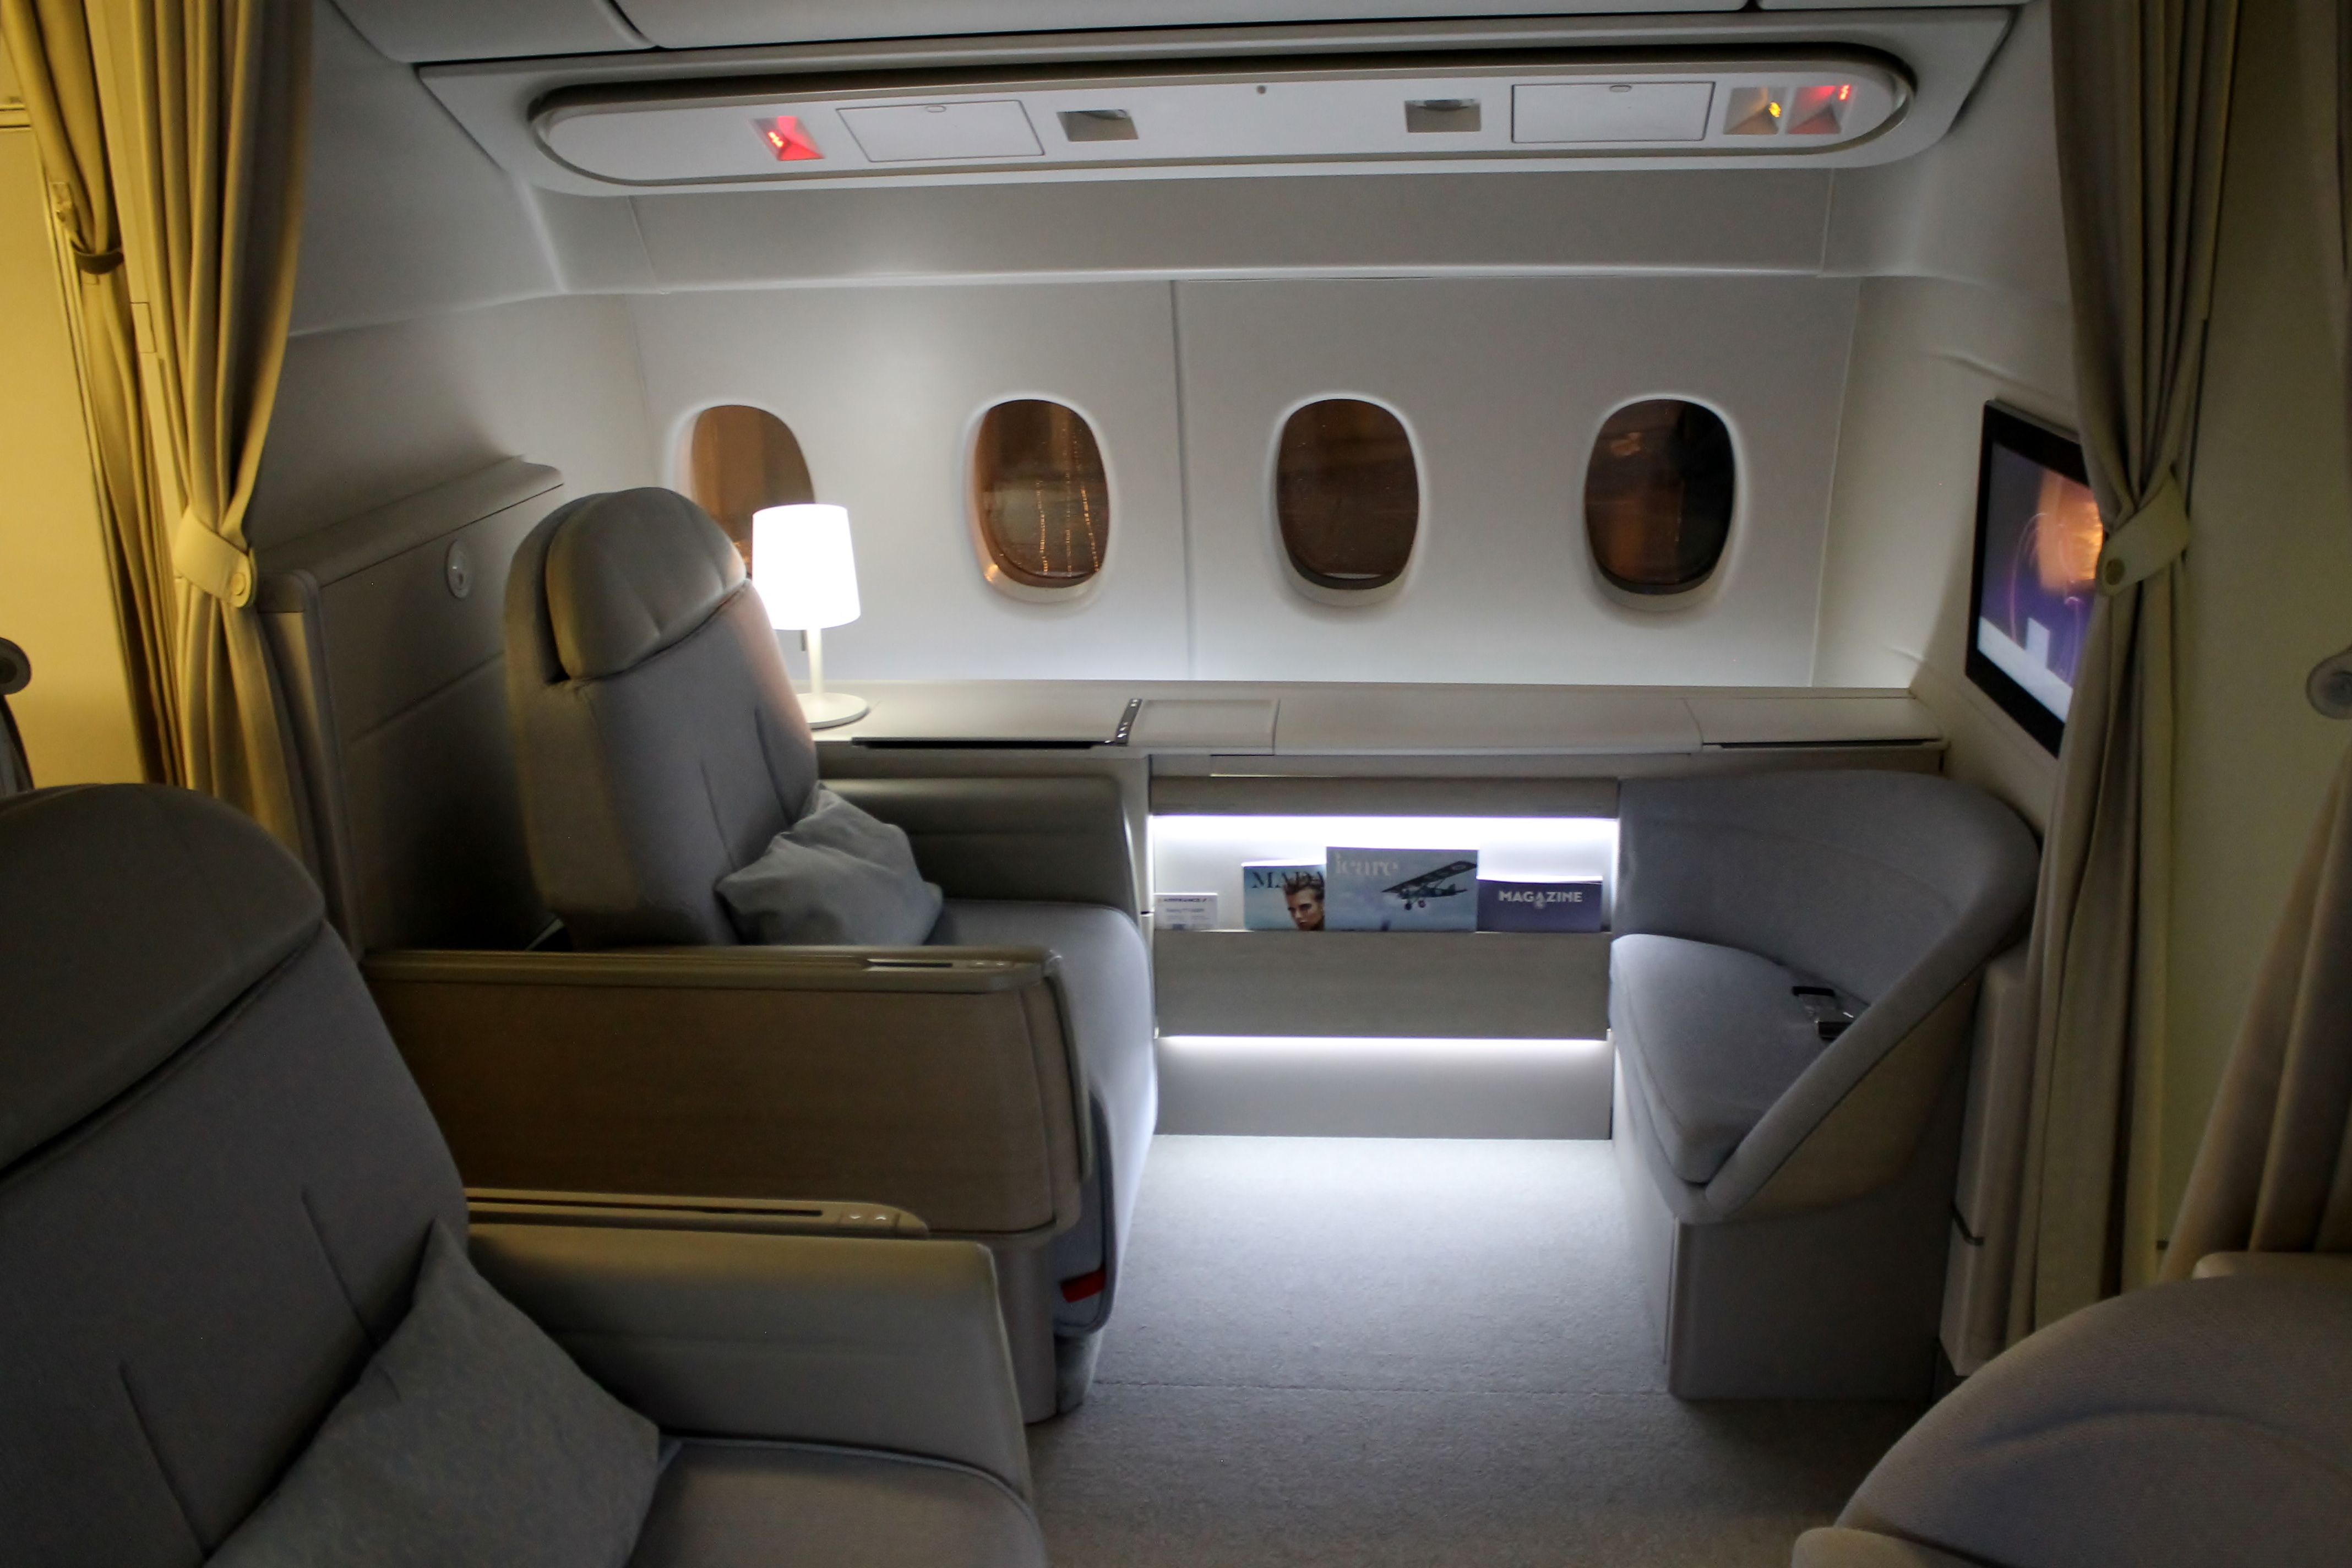 AirFrance 777 New First Class 飛行機